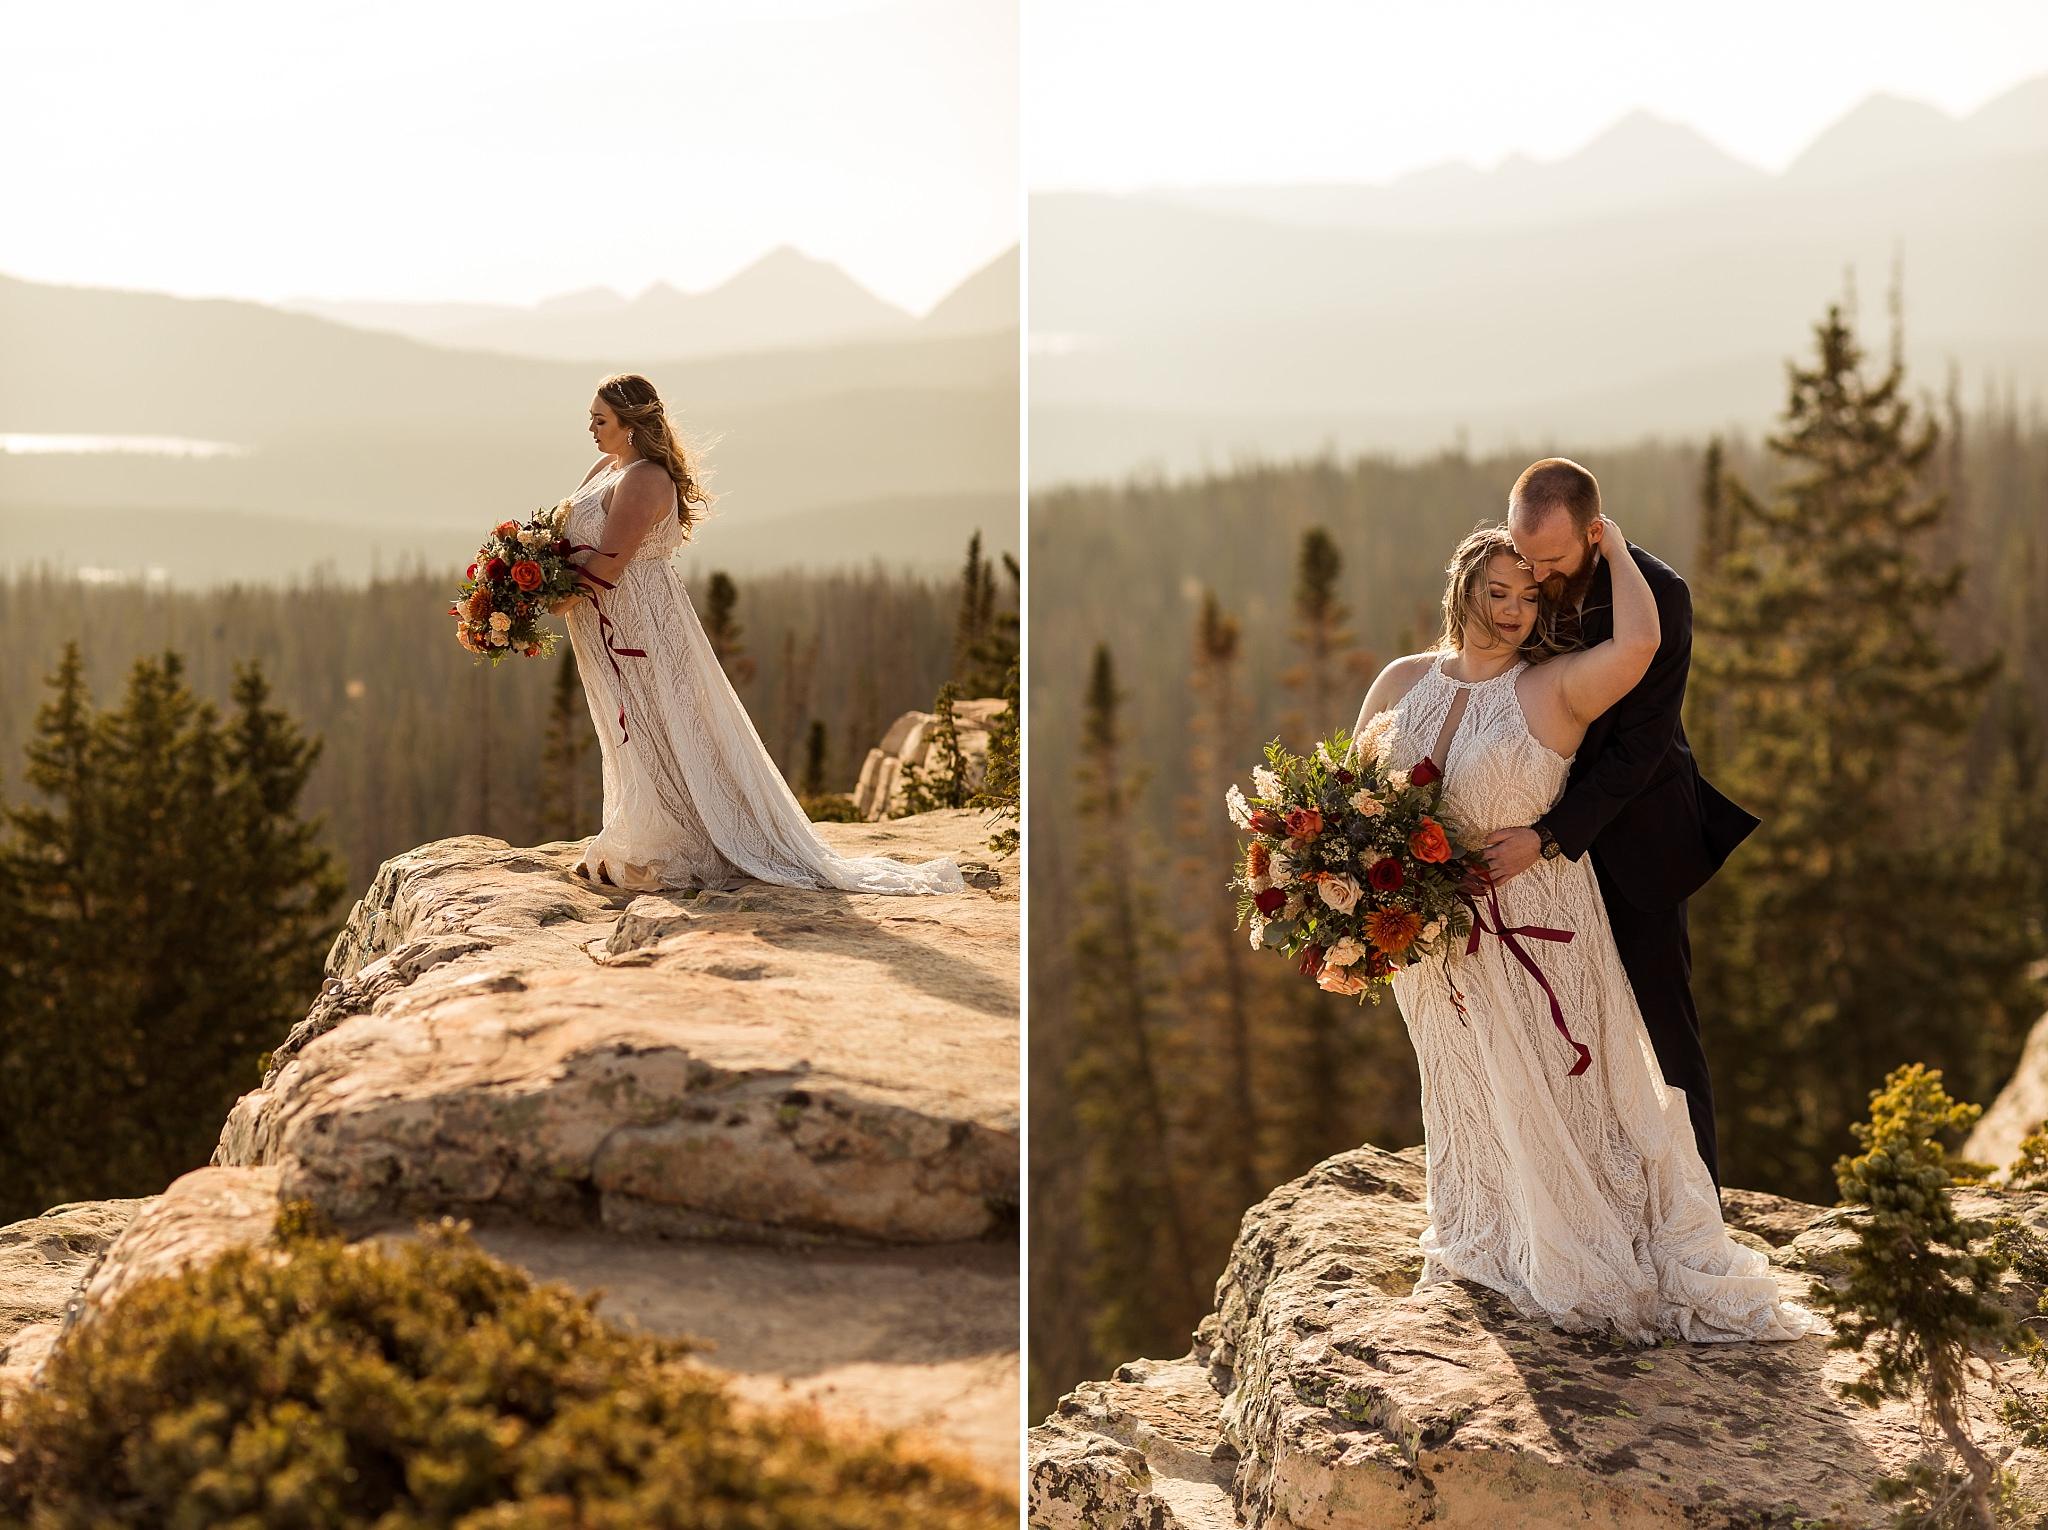 Wedding Portraits on a Cliff